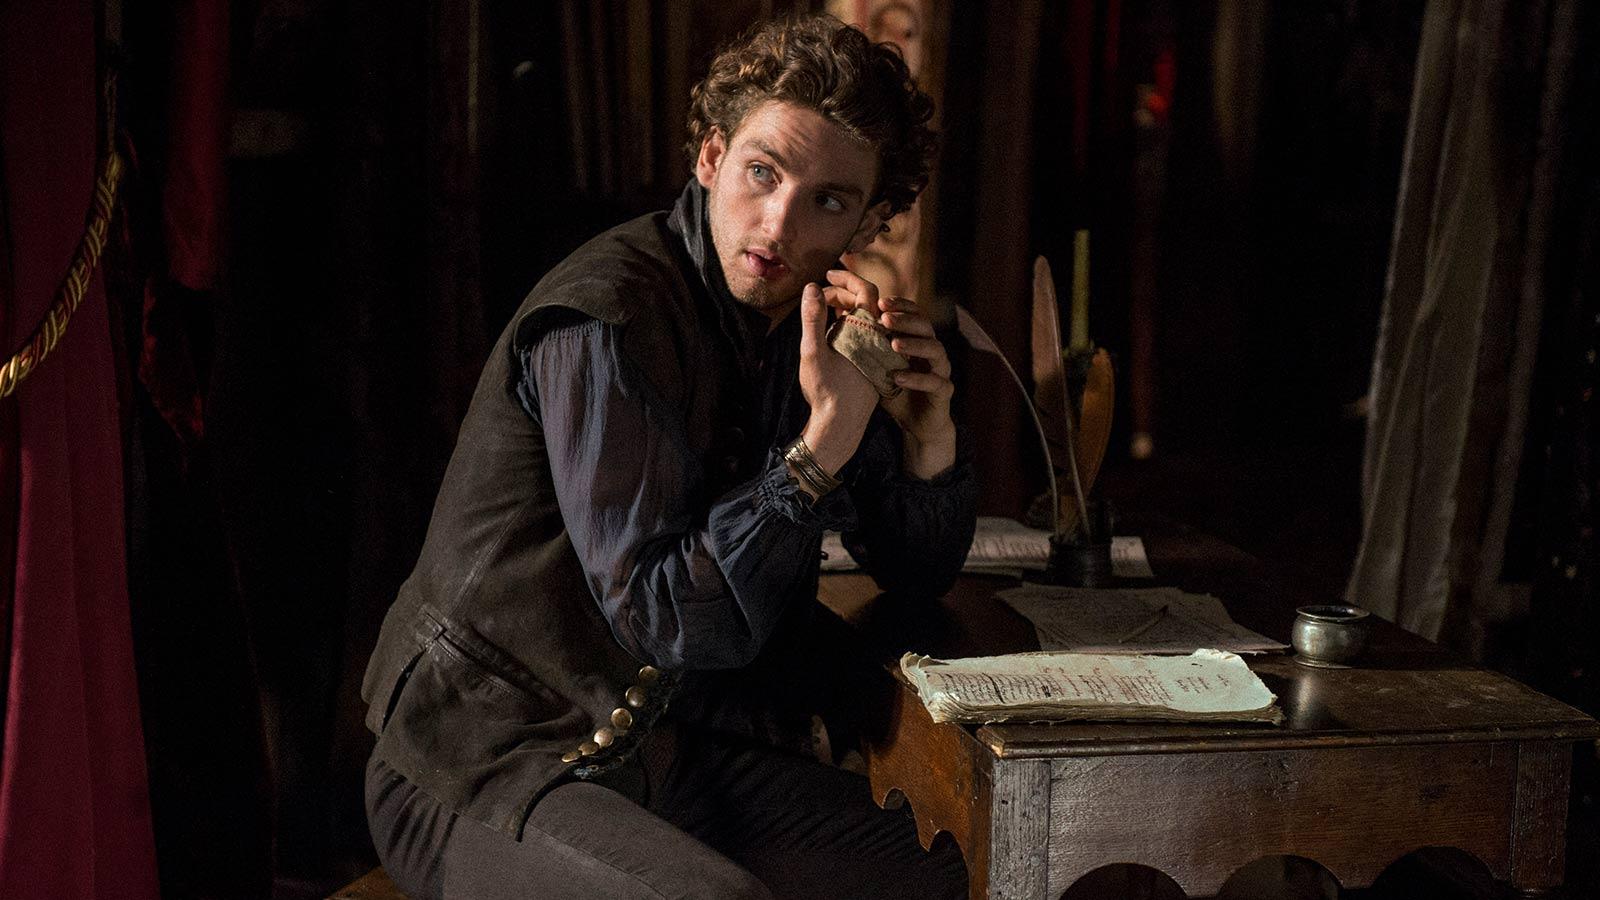 William Shakespeare, personaj de serial, din 13 iulie la TNT!